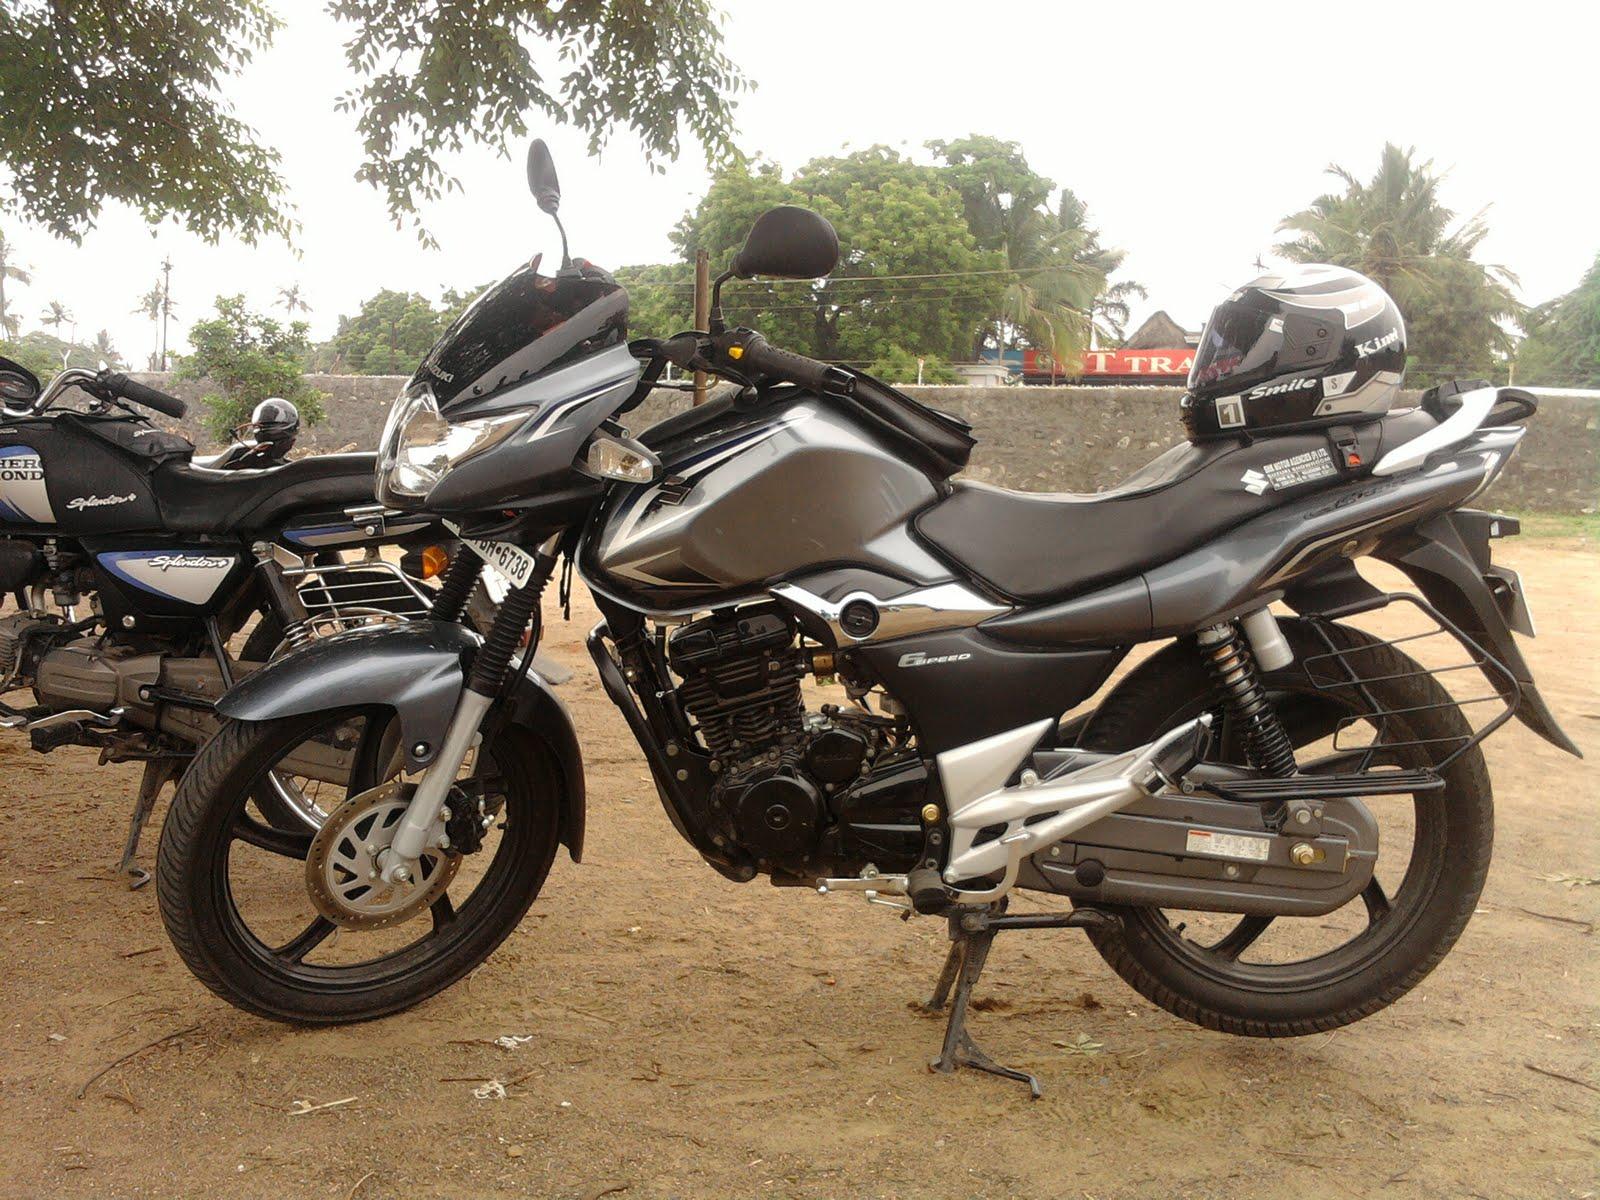 http://1.bp.blogspot.com/_DQNumca3YWw/TQ5Evex_KyI/AAAAAAAAB1c/a2jKcAvpfNU/s1600/bike-suzuki-gs150r_2.jpg